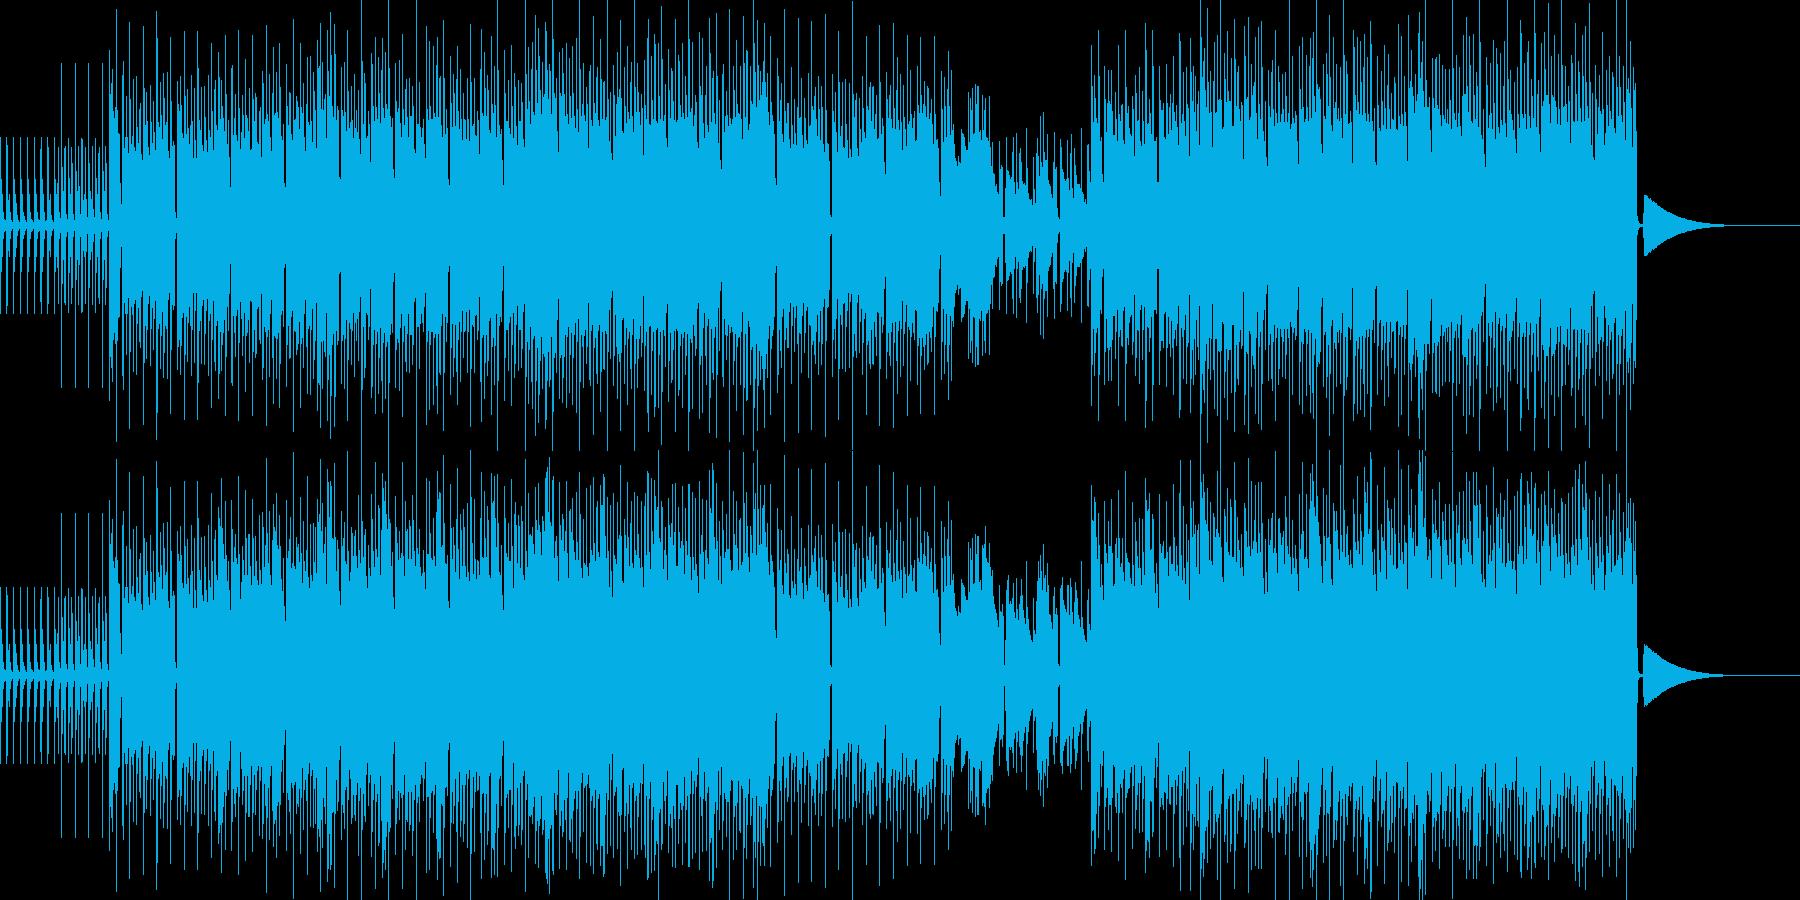 test3の再生済みの波形